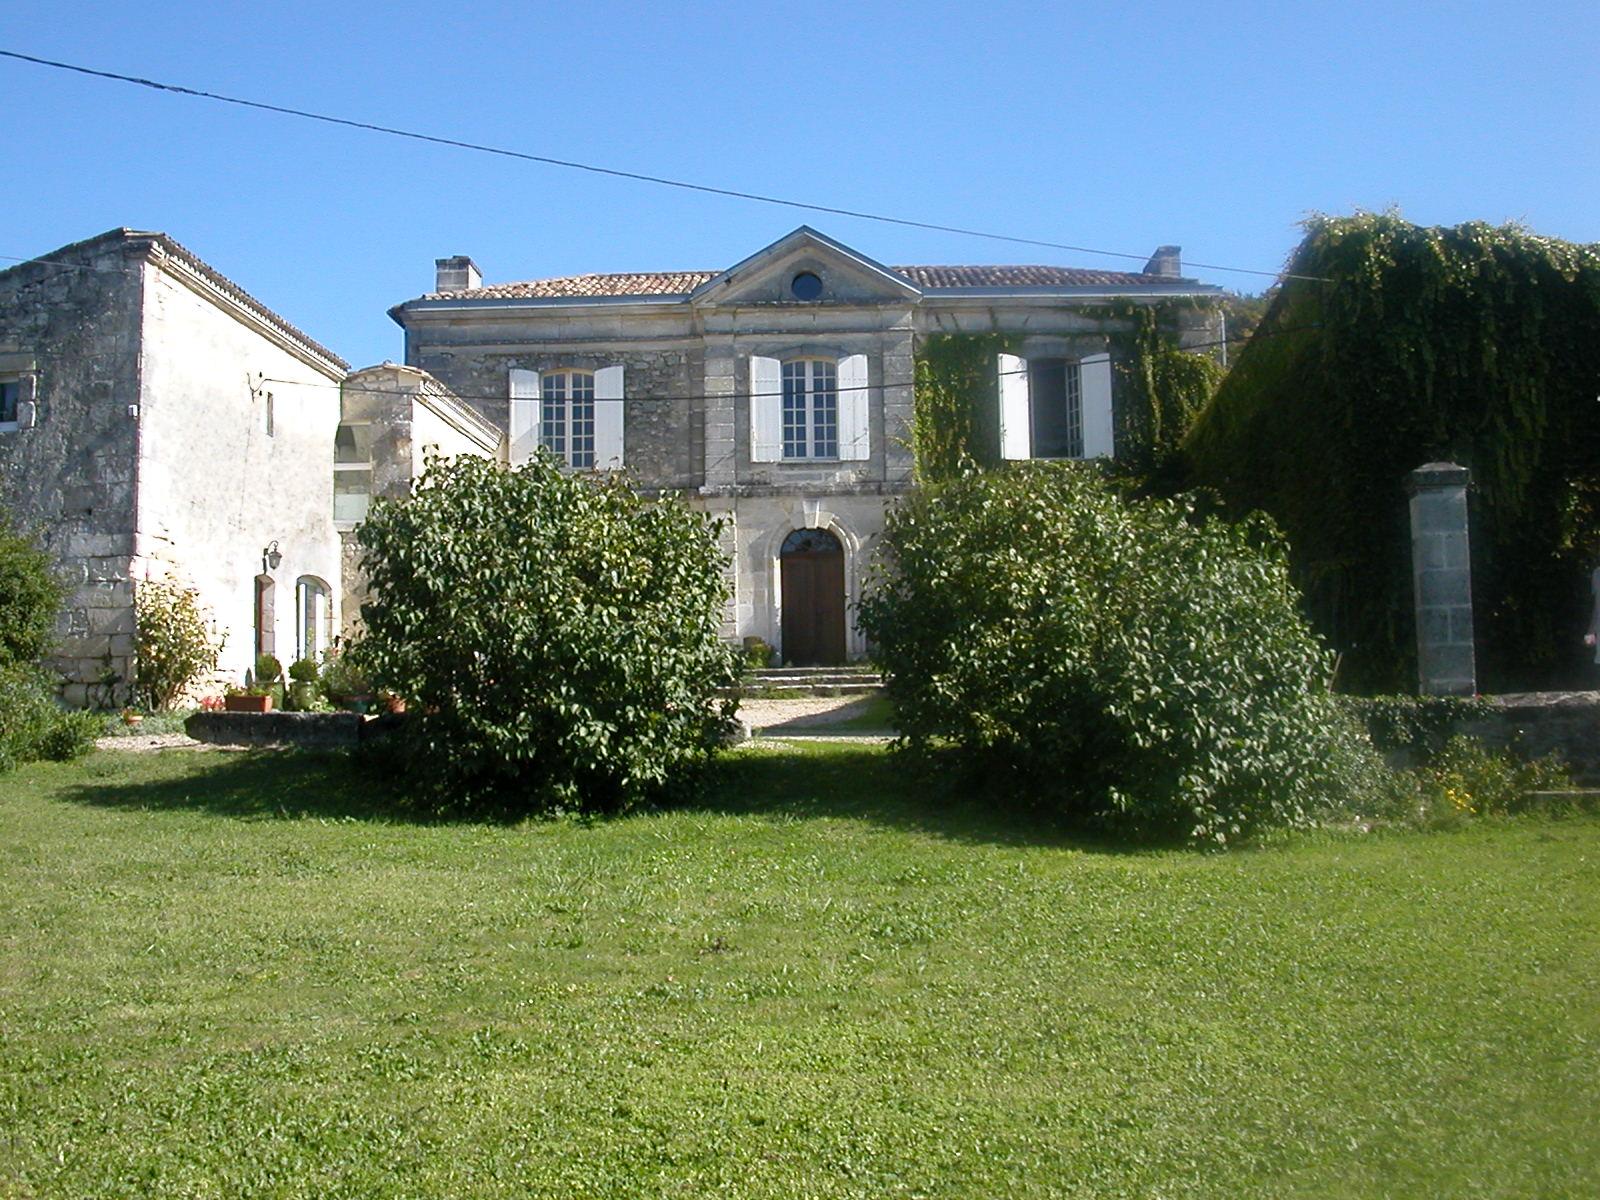 Château Renard Mondésir, Fronsac (33) - Bordelais